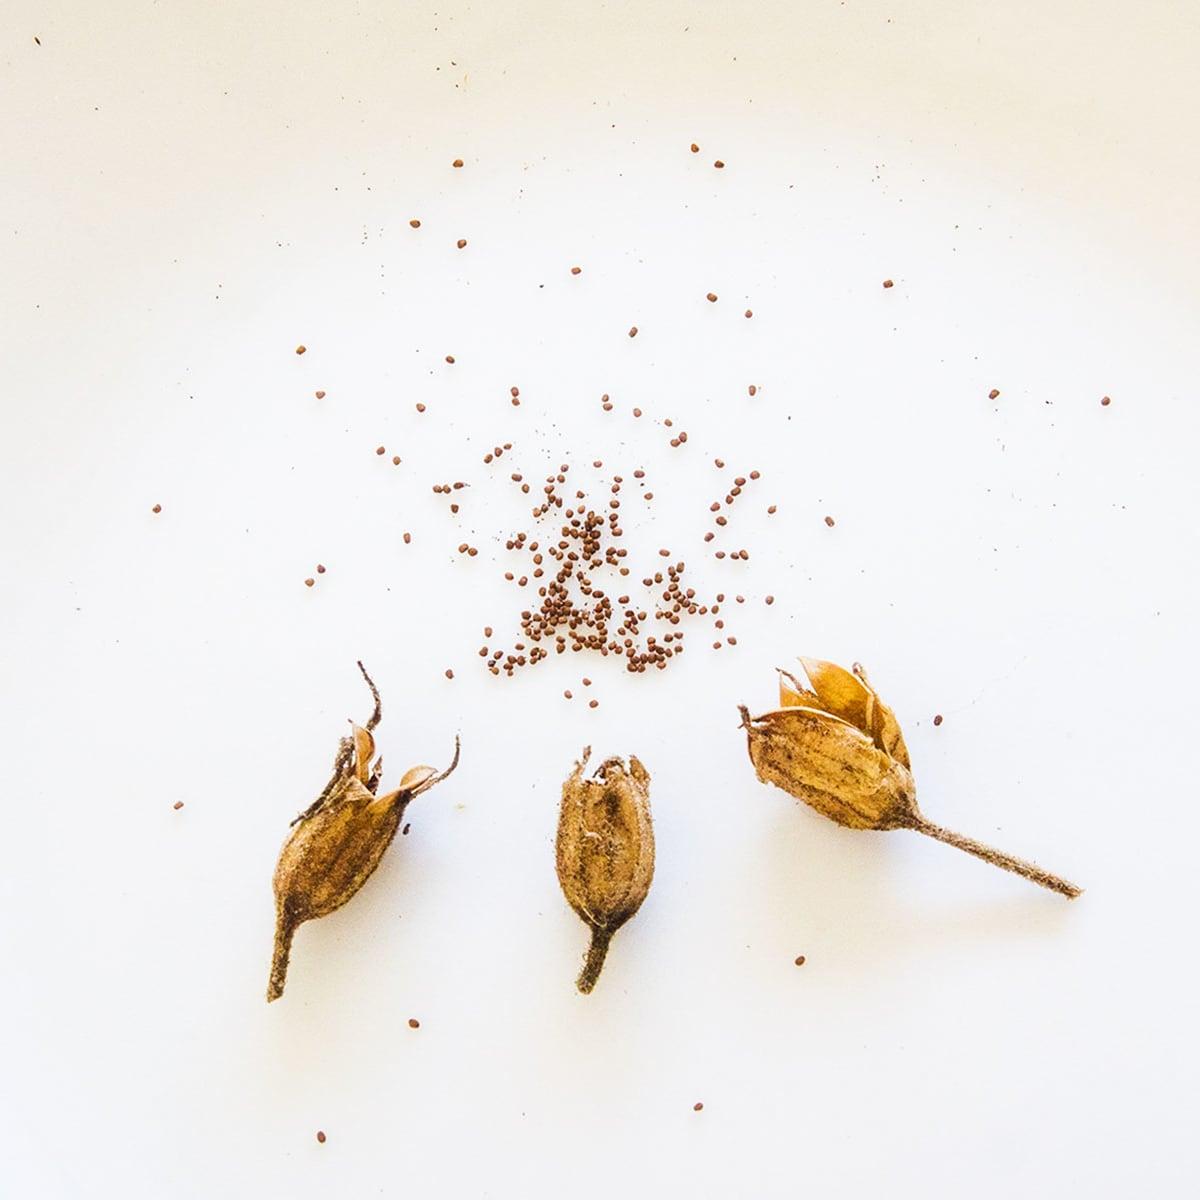 Photo of nicotiana seeds